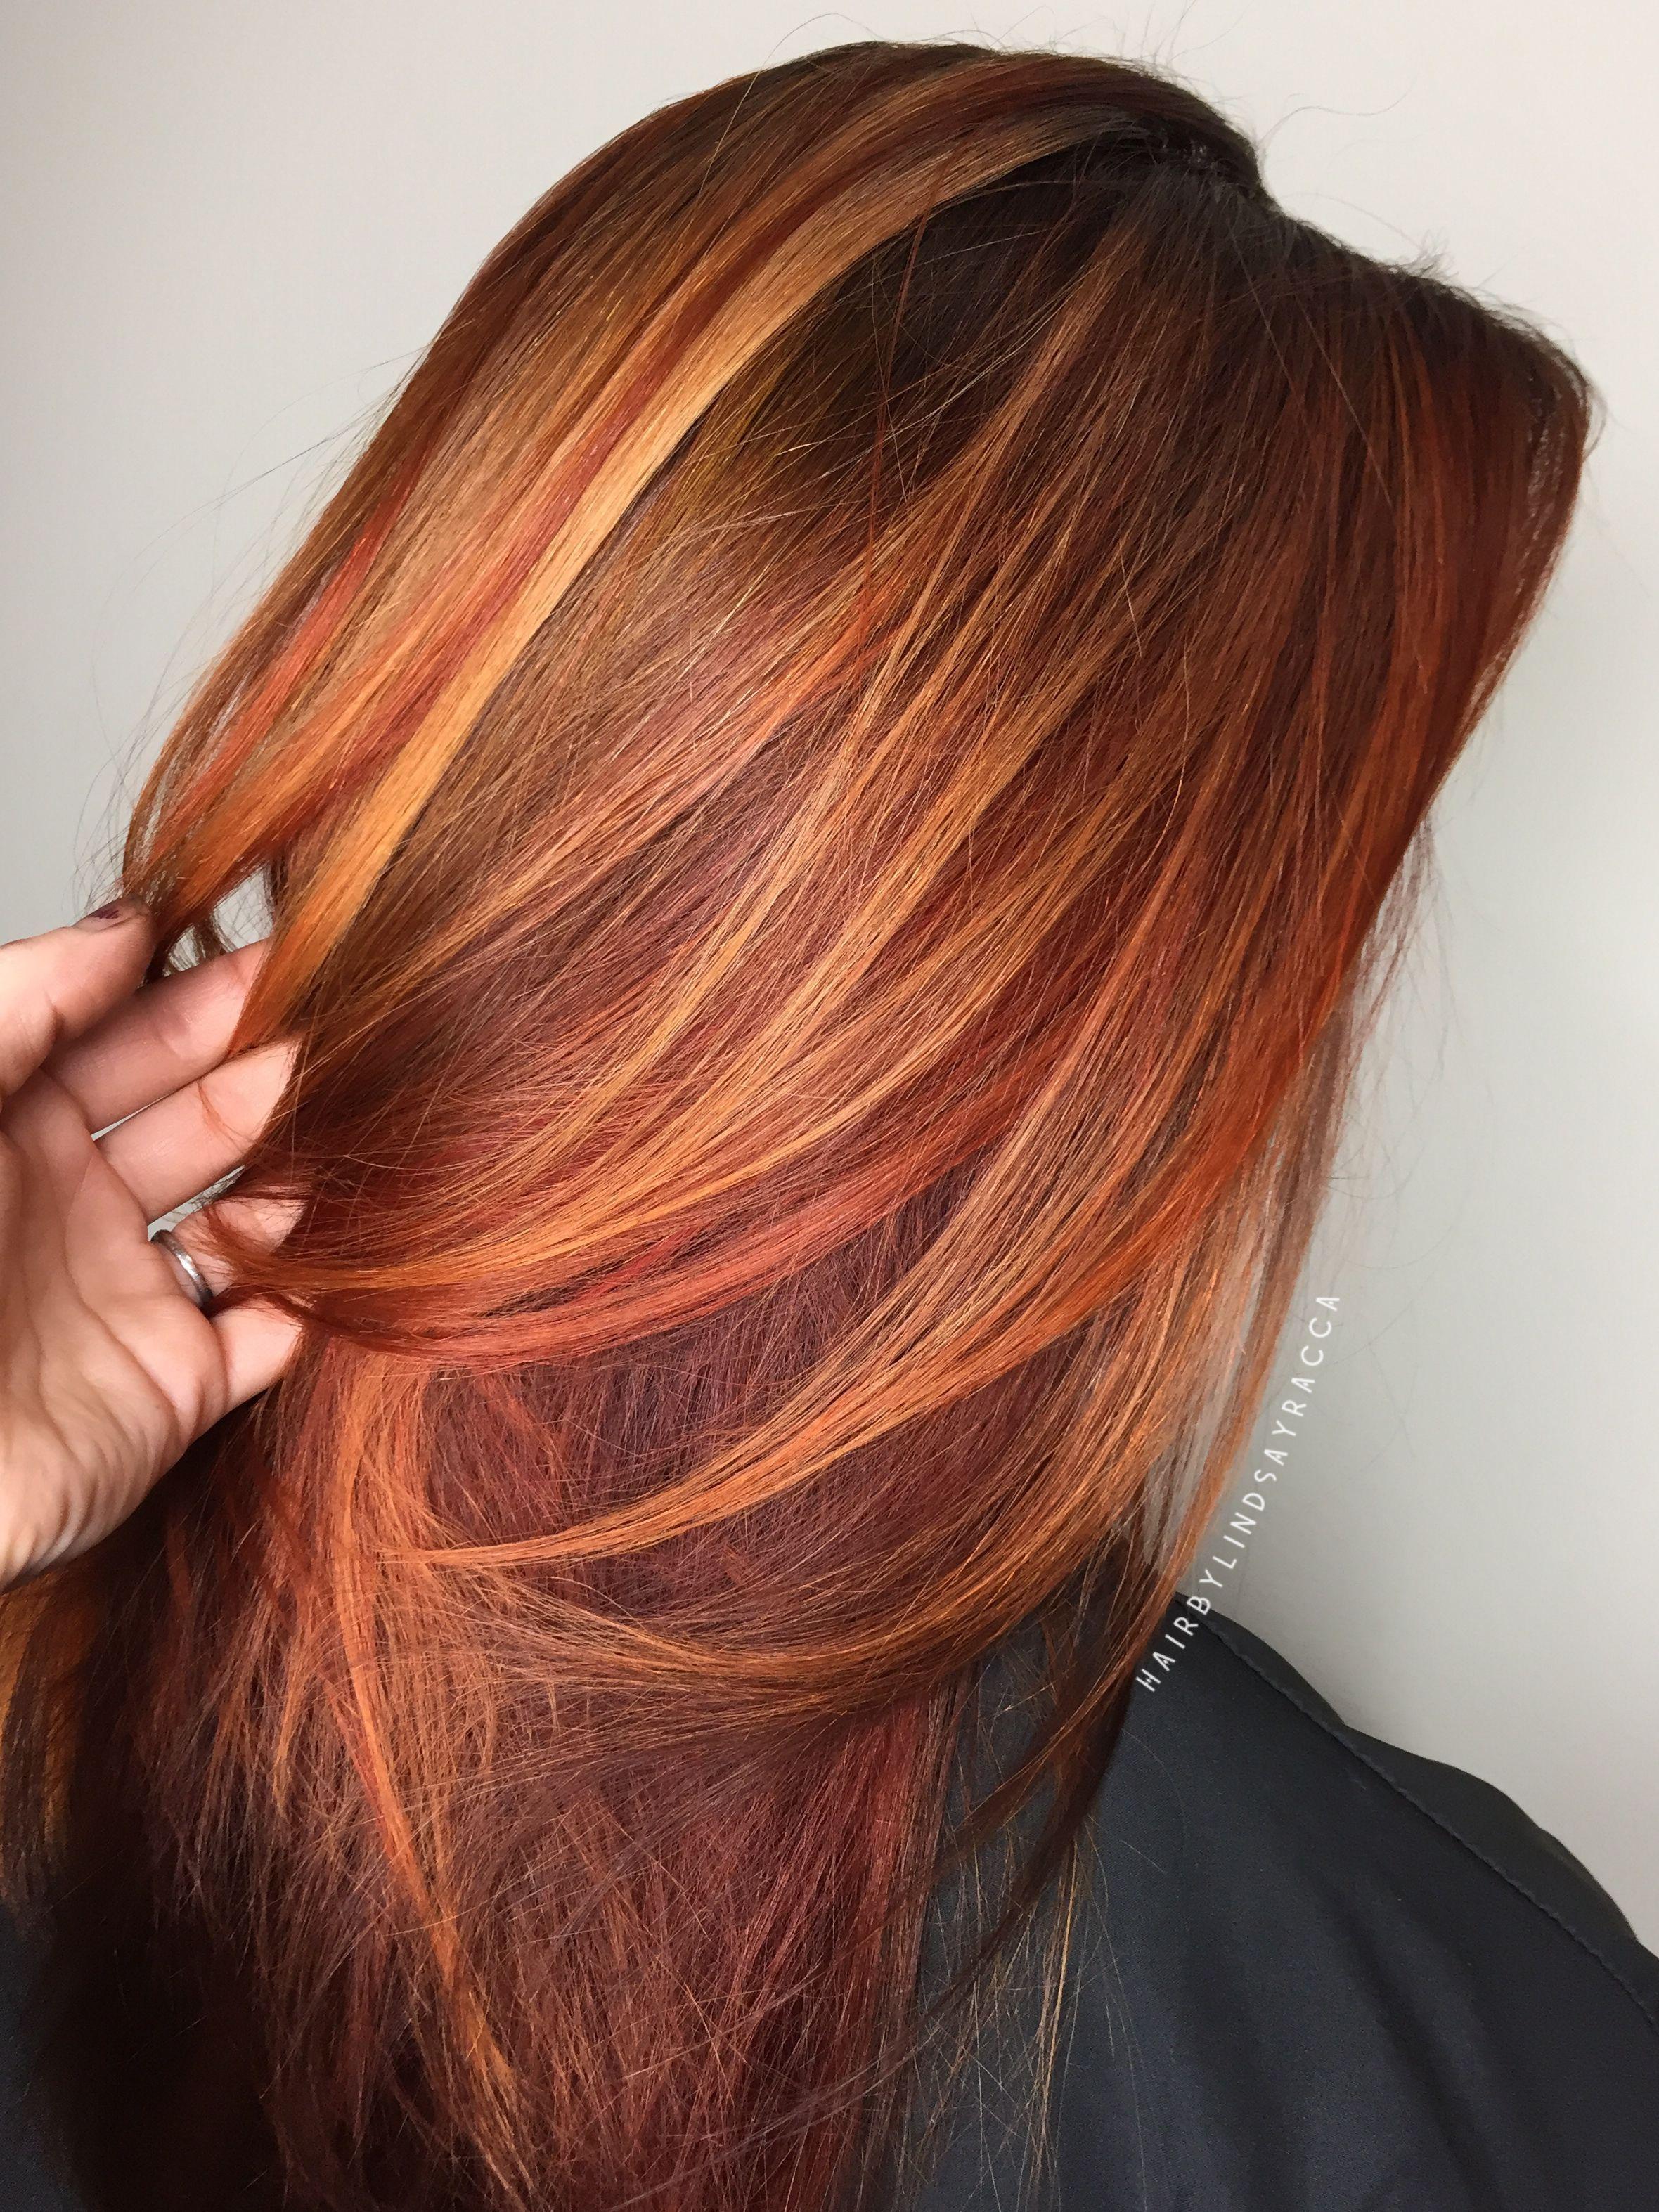 Pin By Doris Scott On My Blog In 2020 Balayage Hair Balayage